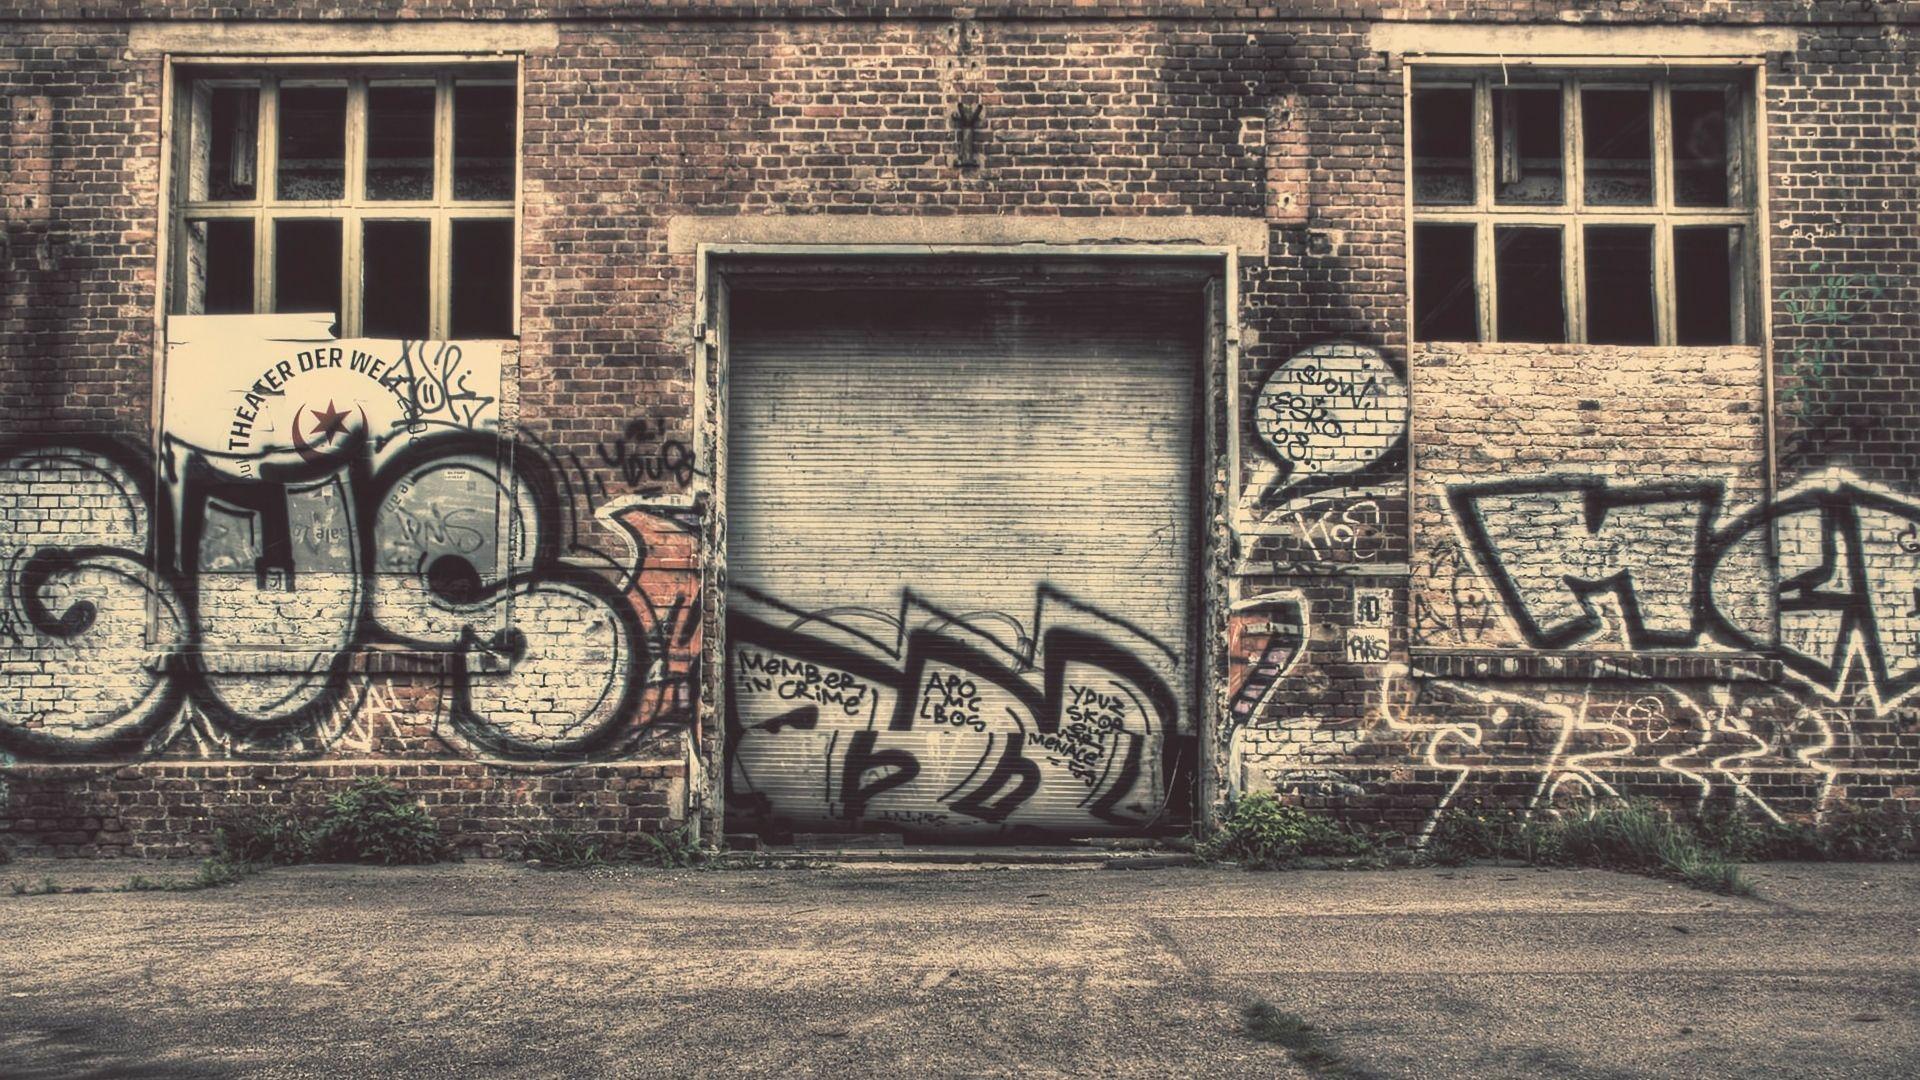 Graffiti City Wall Street